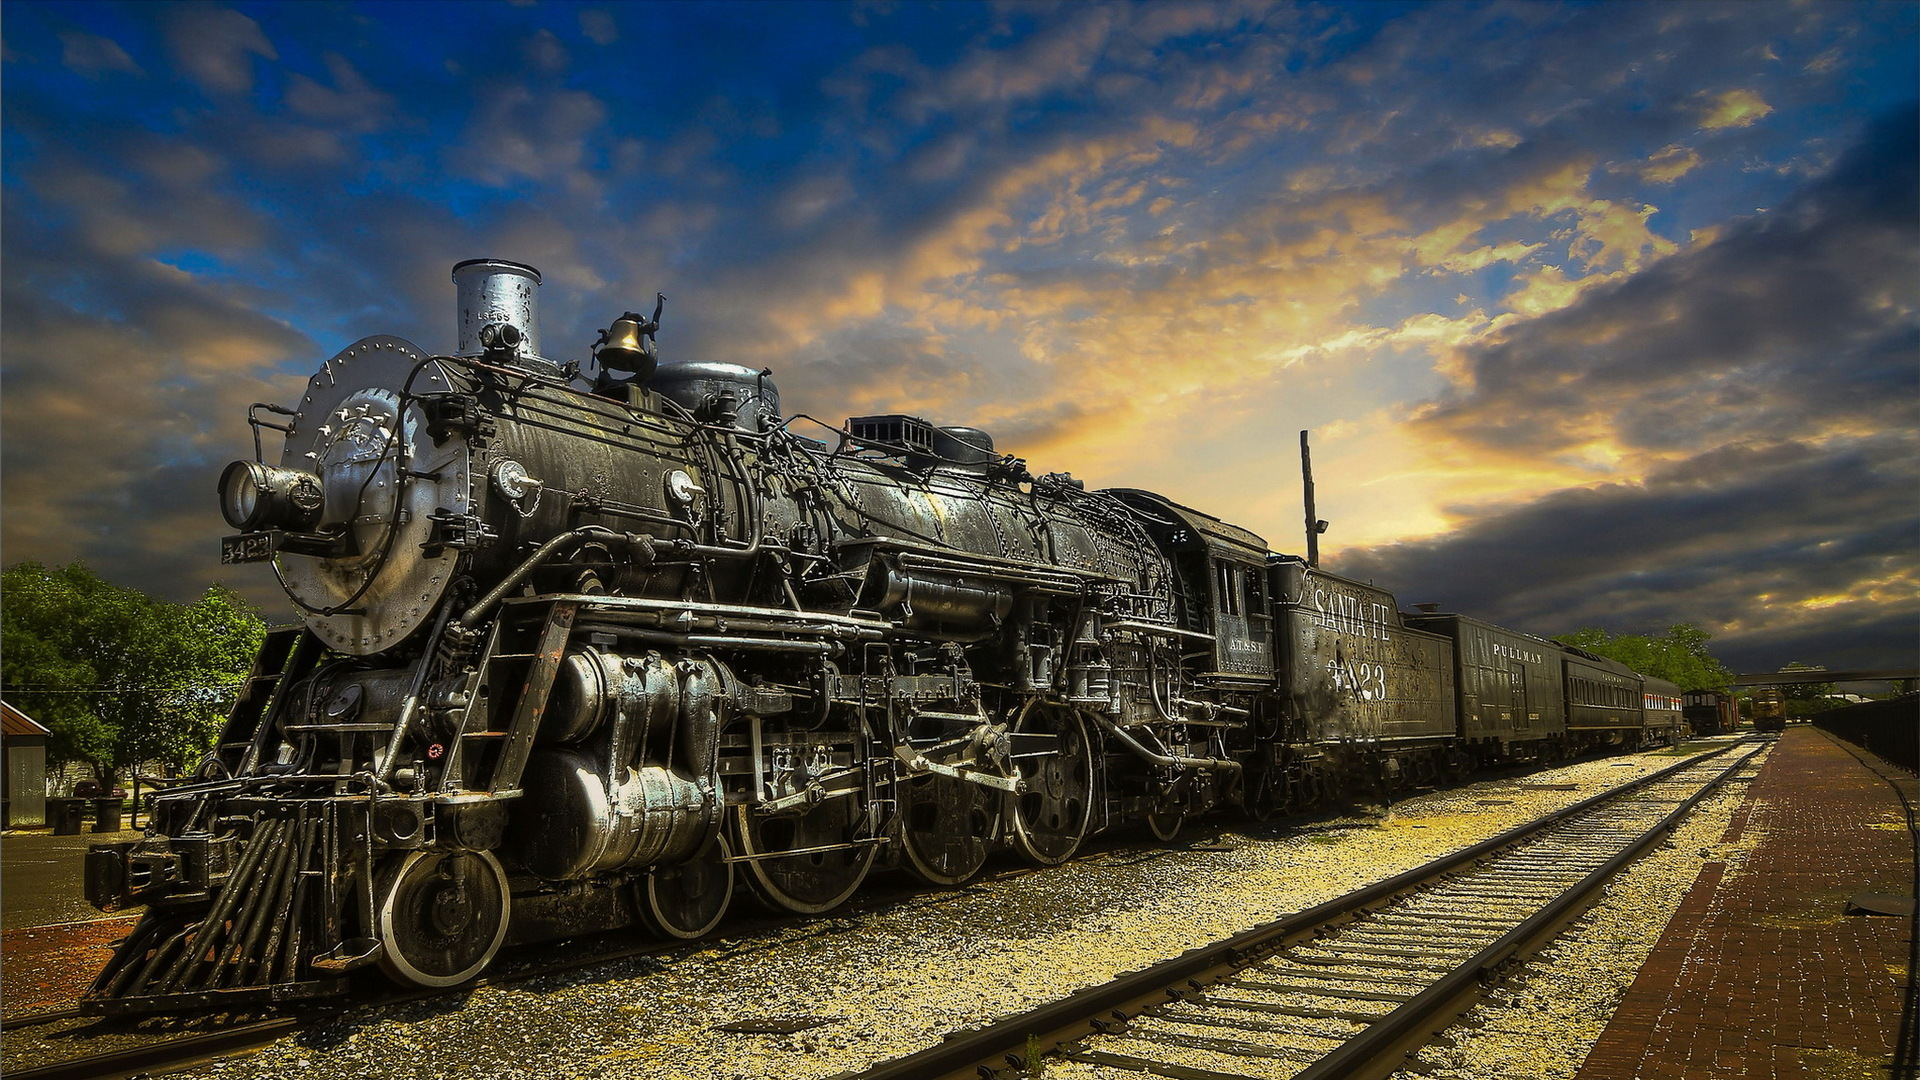 Fantastic Santa Fe Steam Train Hdr Hd Desktop Background HD wallpapers